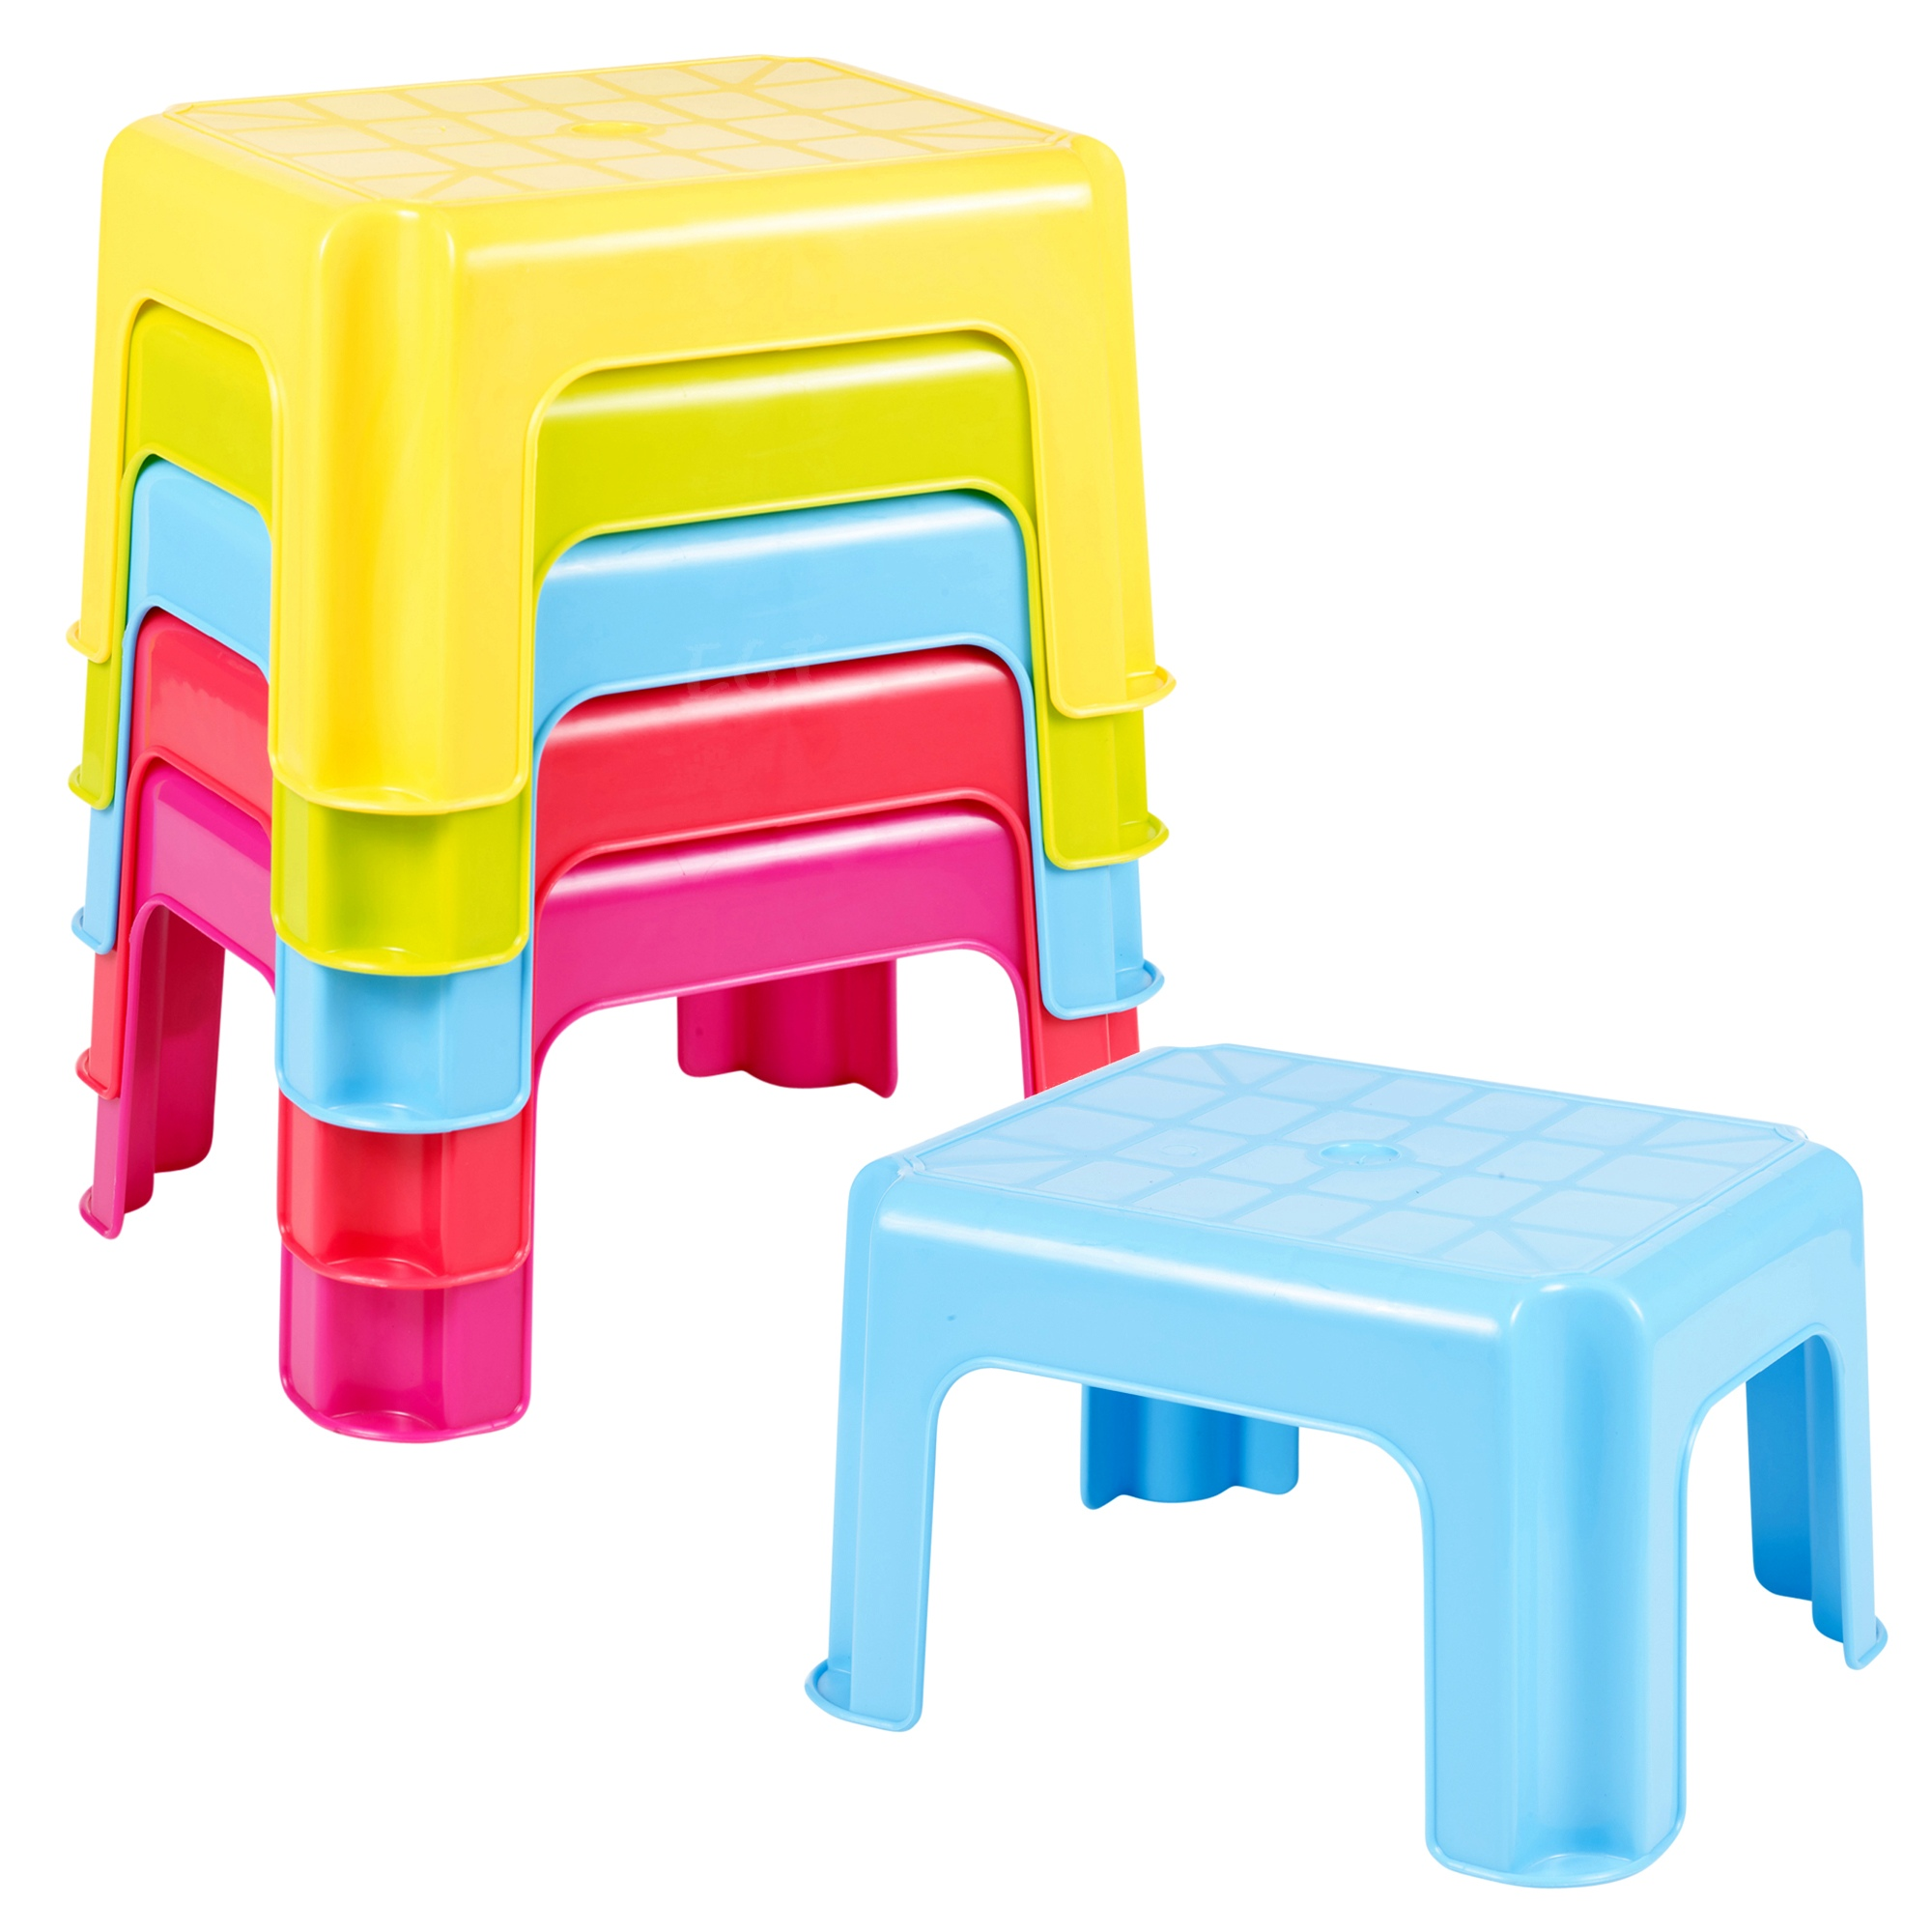 mehrzweck robuster kunststoff tritthocker stapelbar kinder sitz rutschfest fu ebay. Black Bedroom Furniture Sets. Home Design Ideas